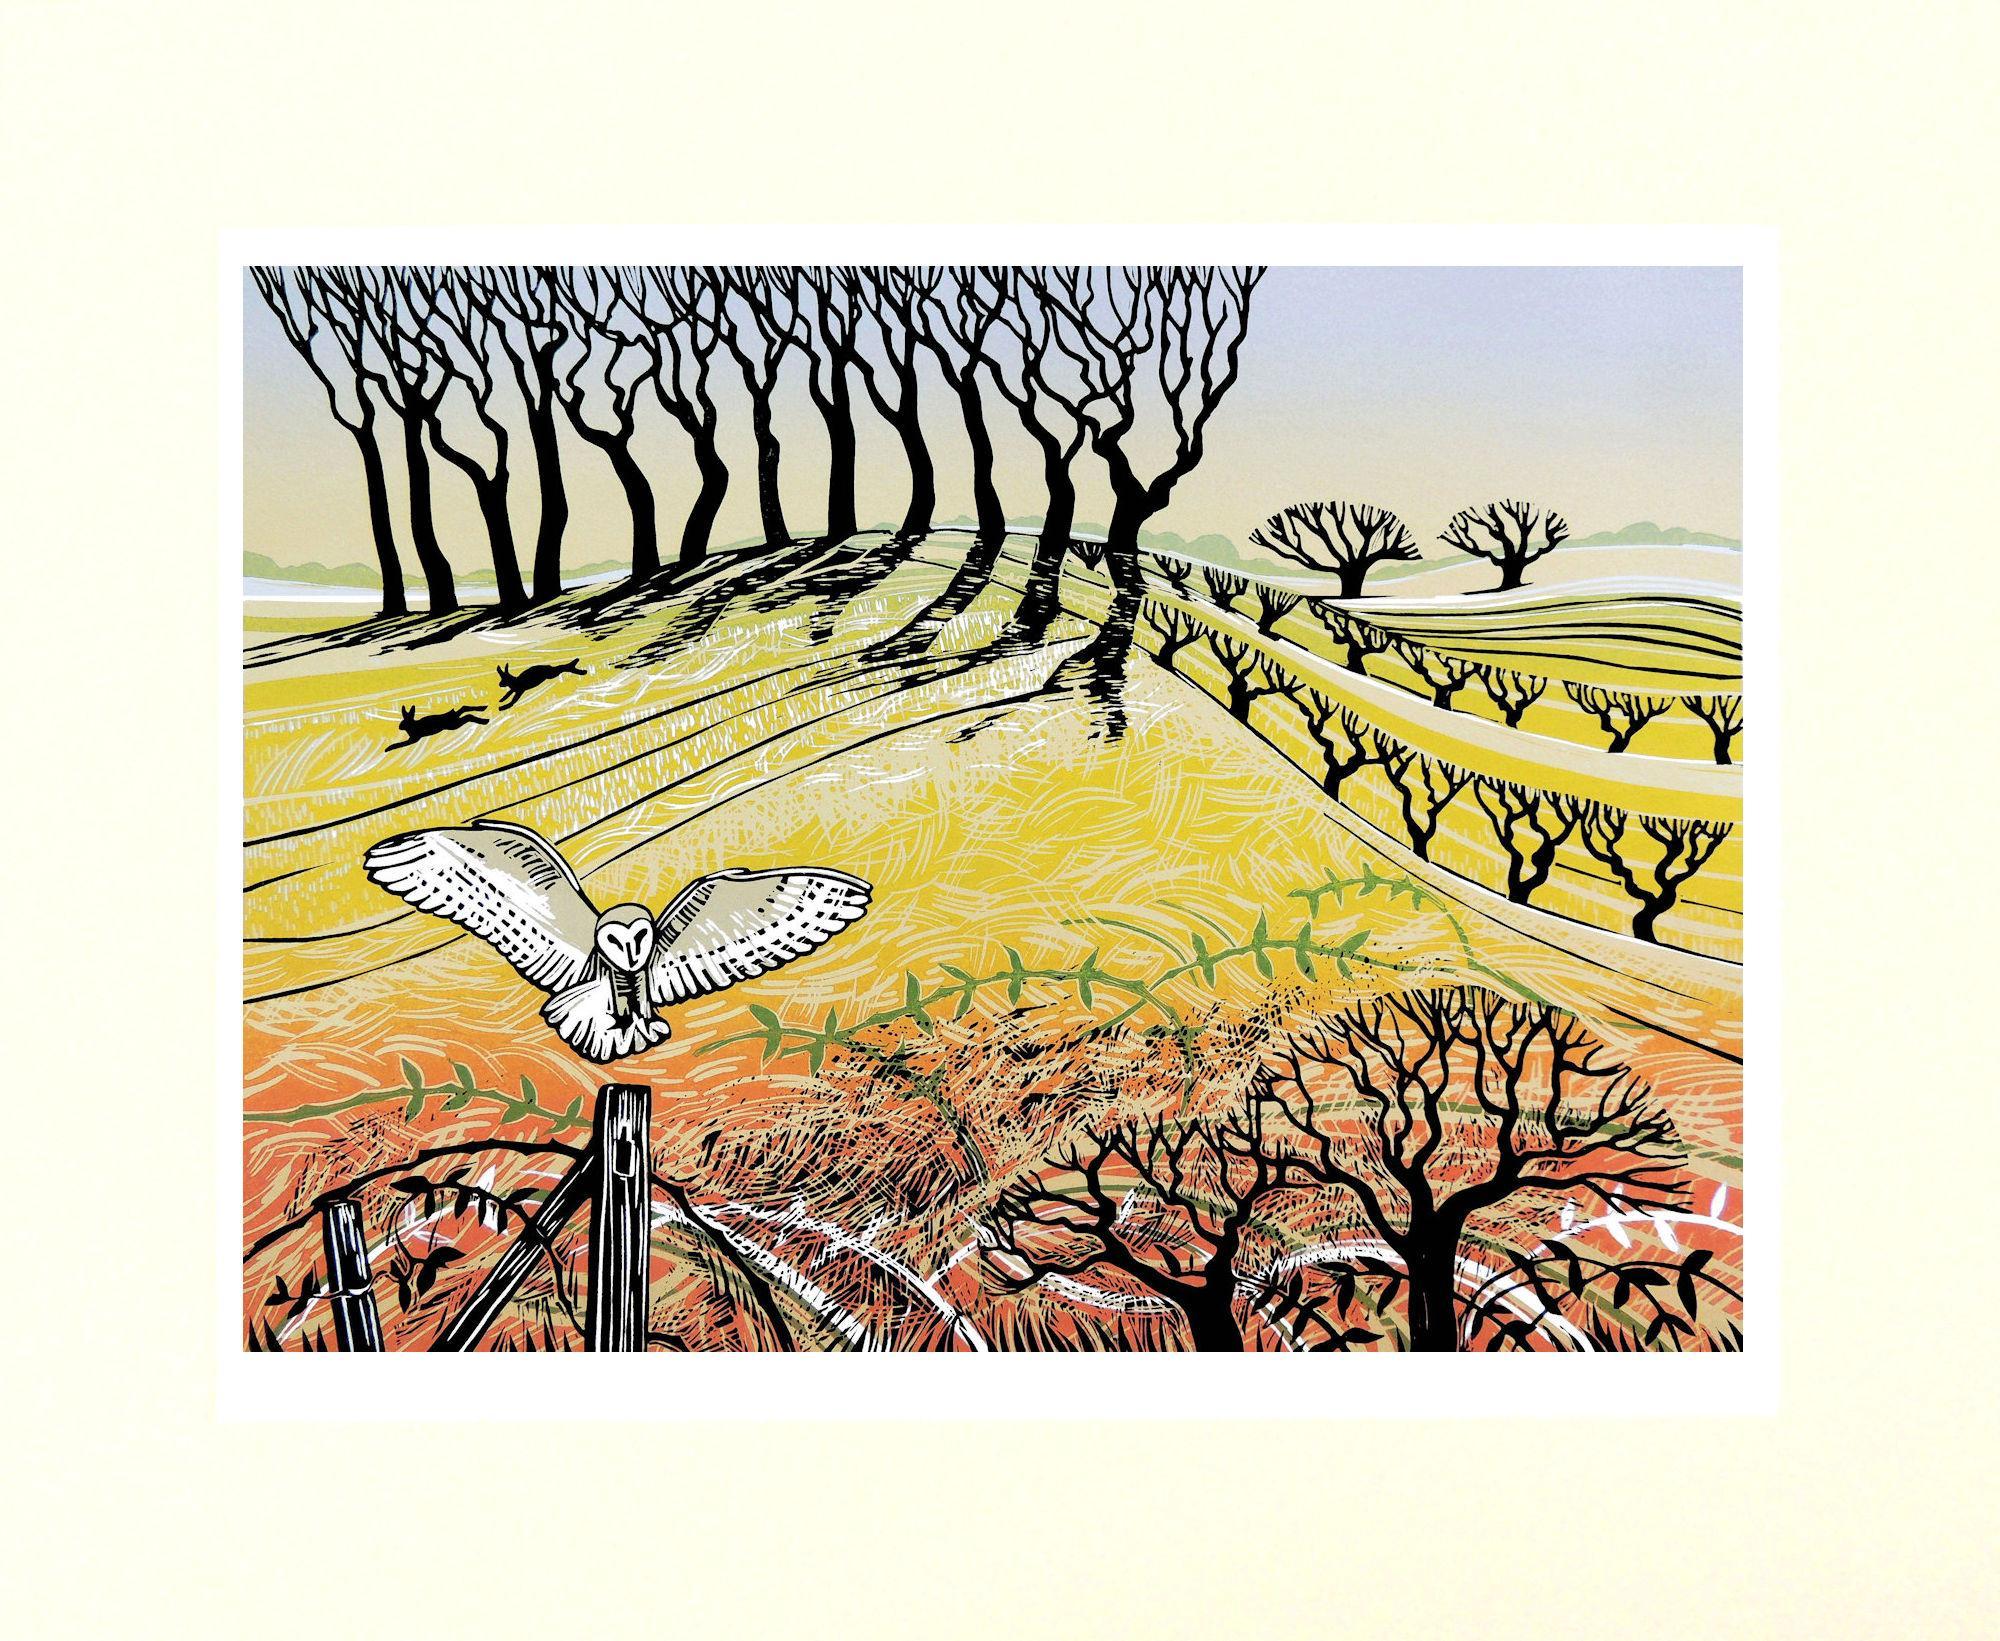 Rob Barnes, The Owl Post, Limited Edition Print, Landscape Art, Art Online